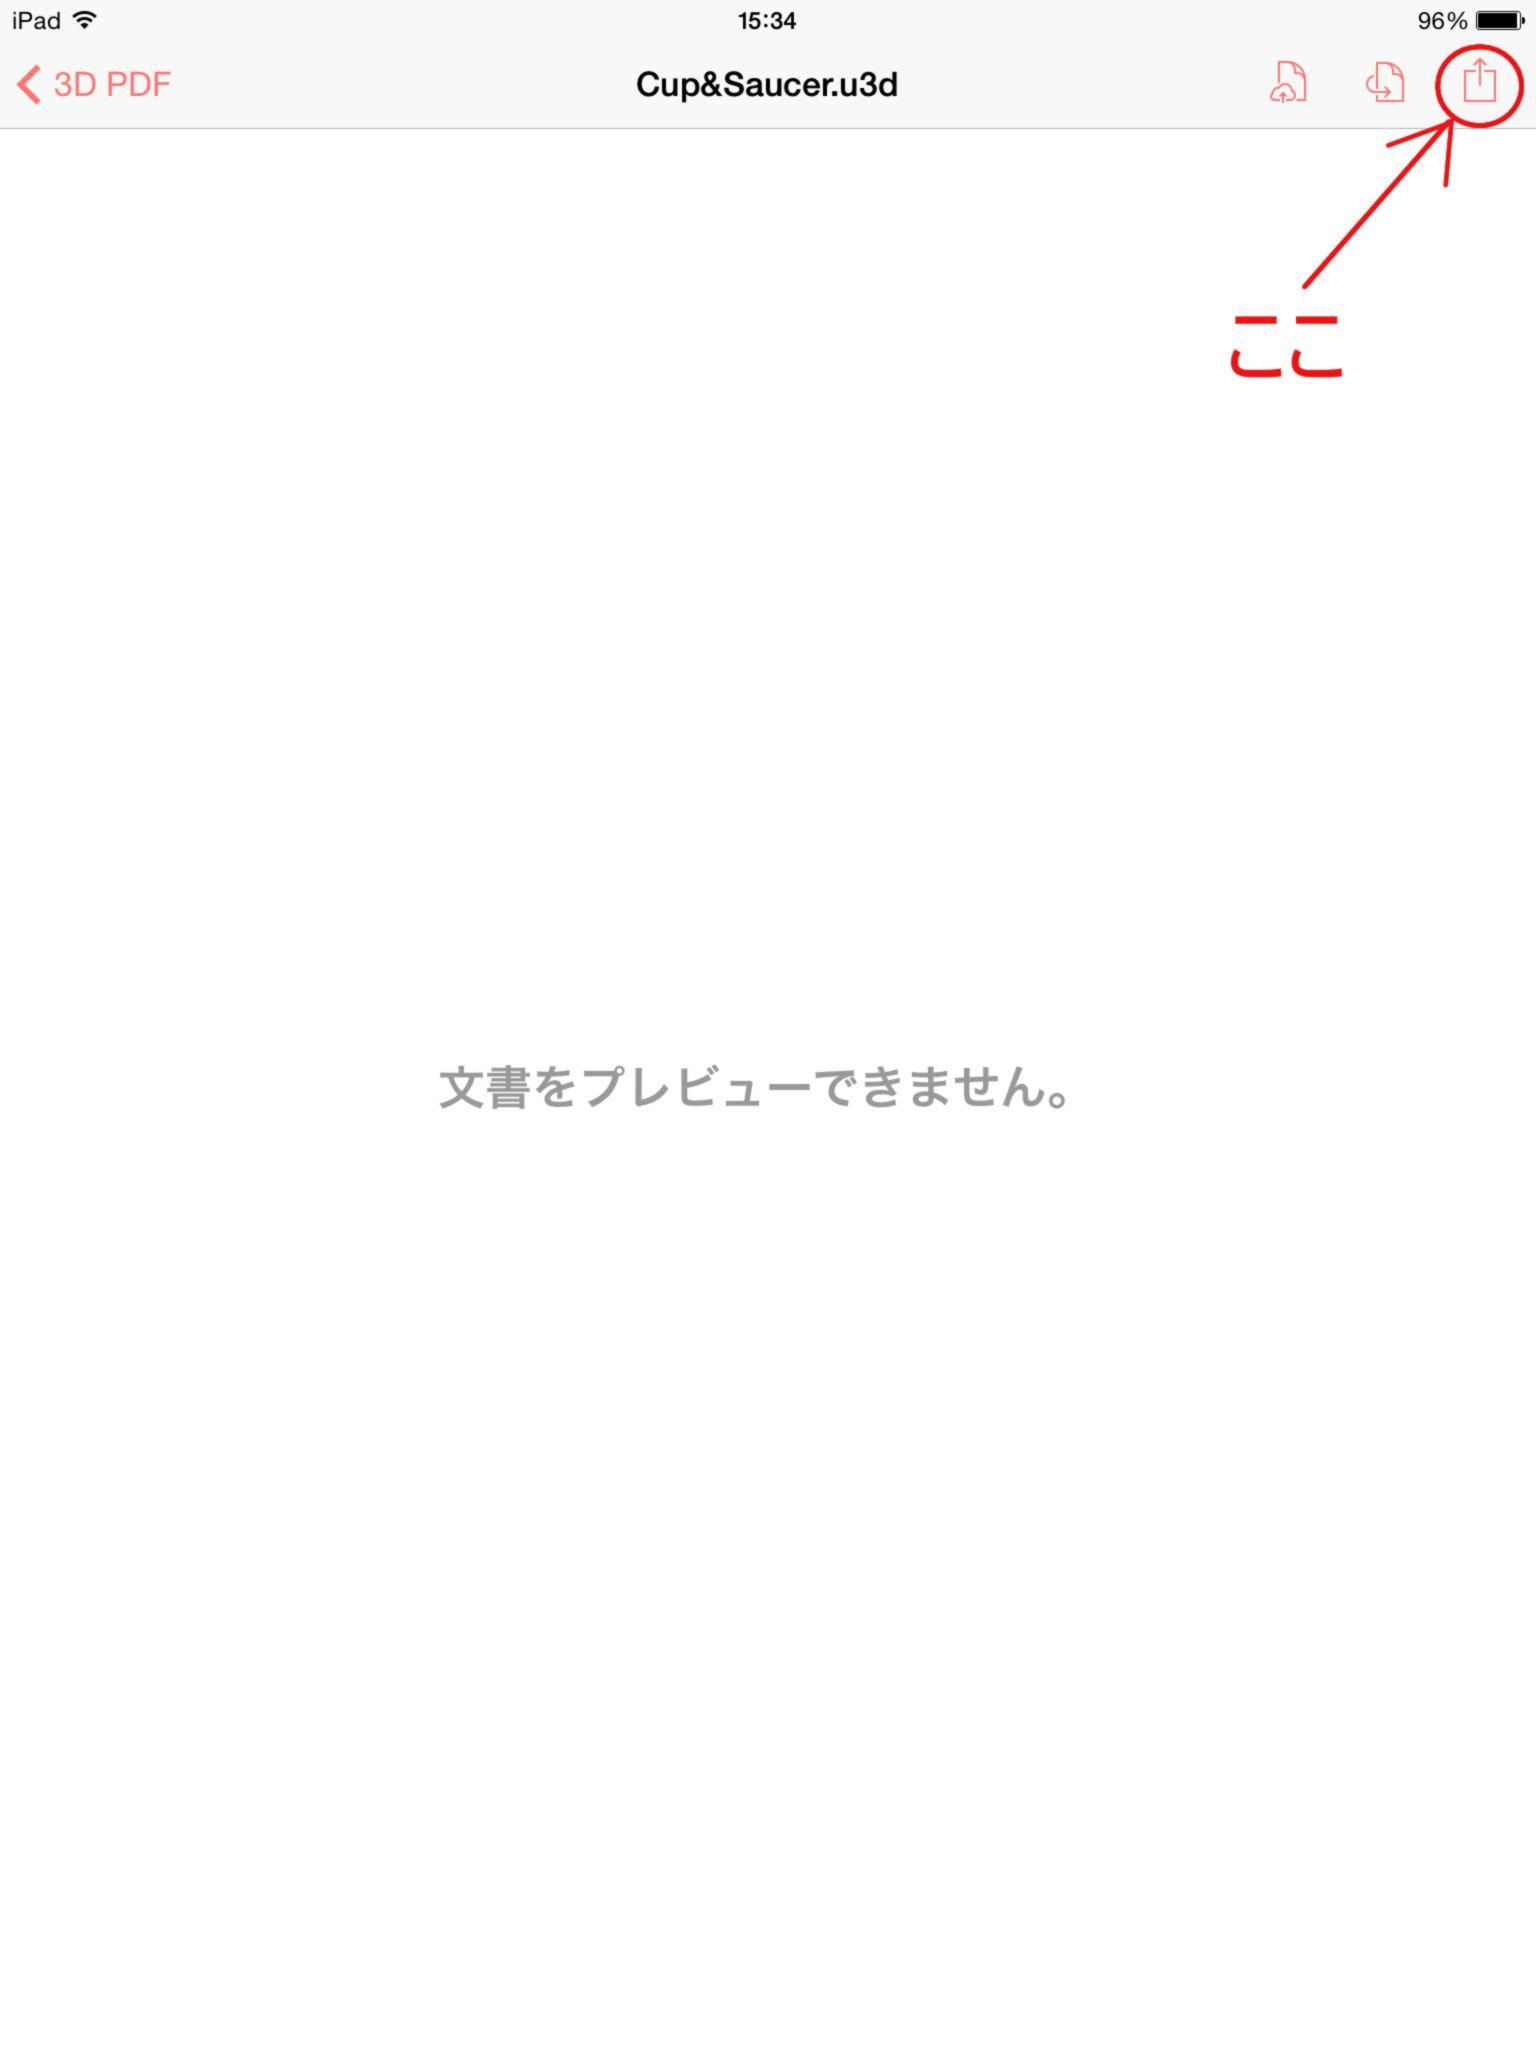 20140729 img_2